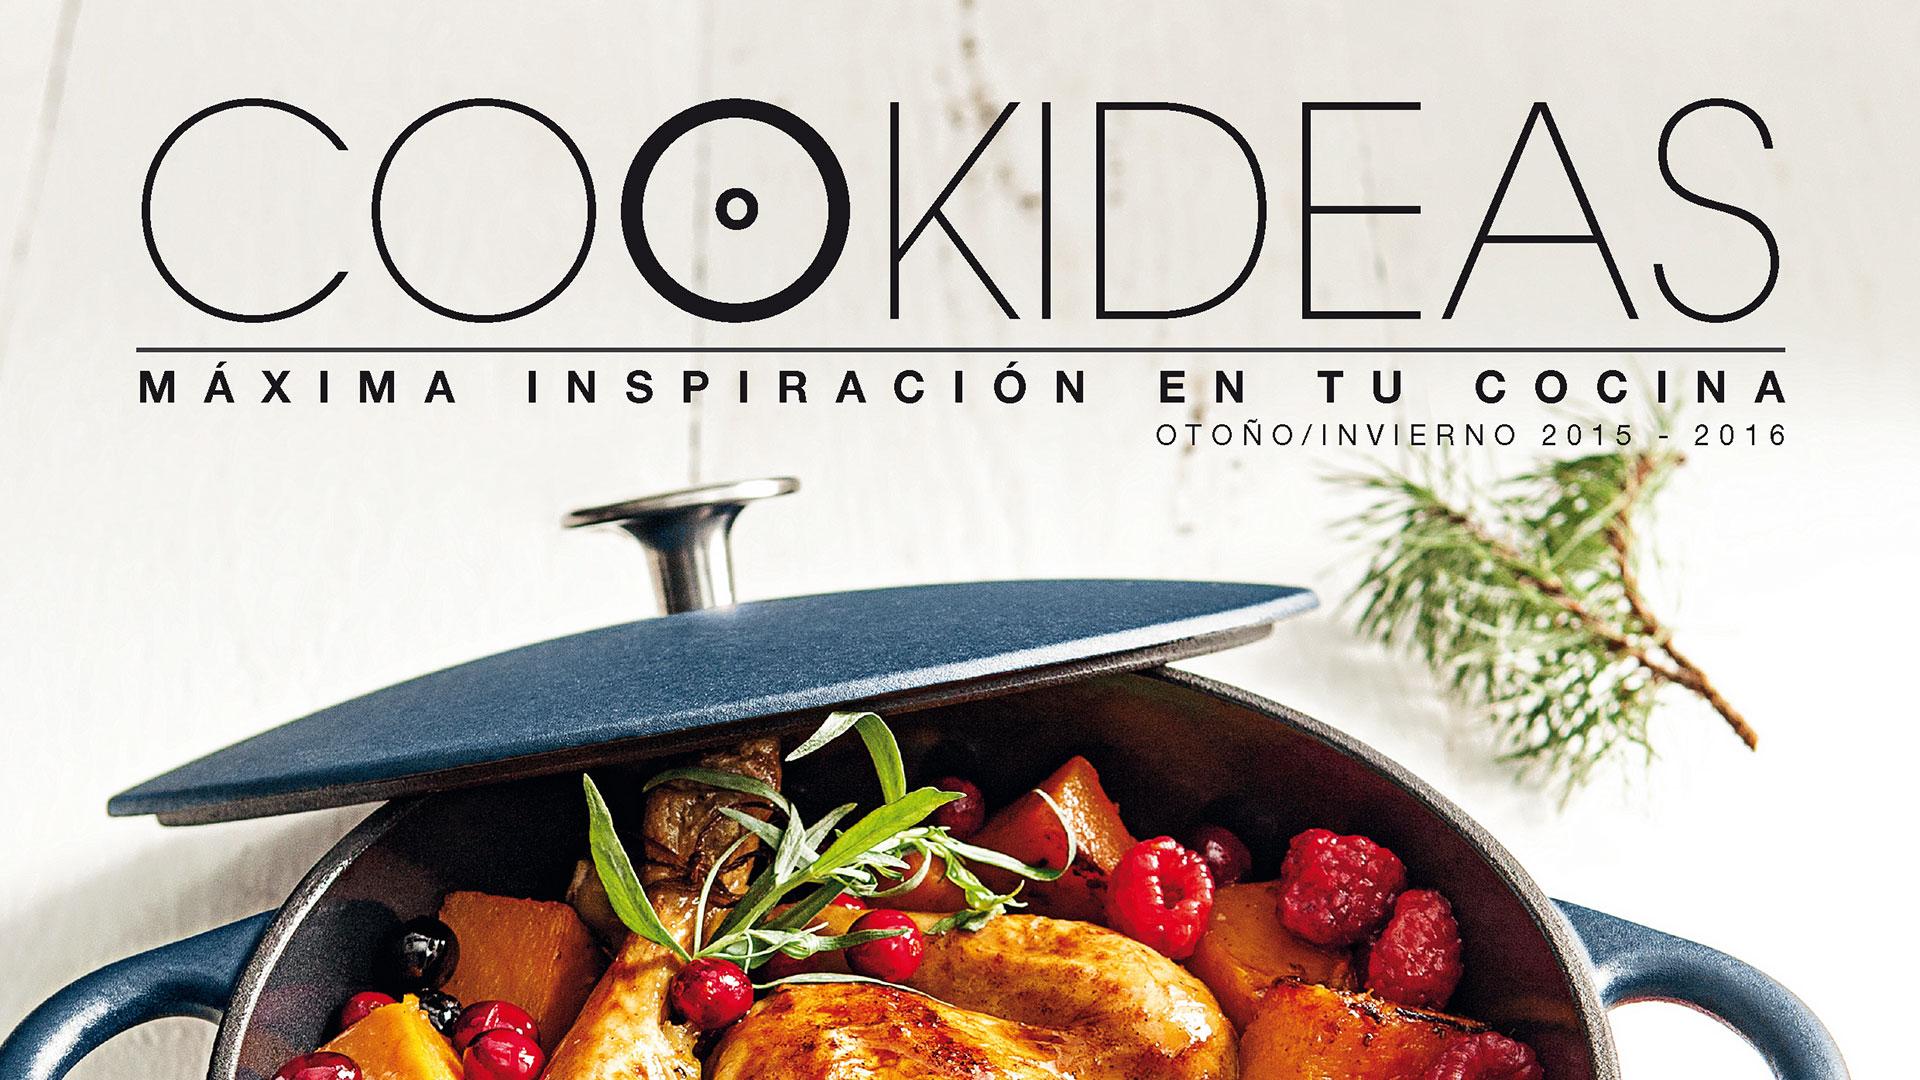 Cookideas1-2